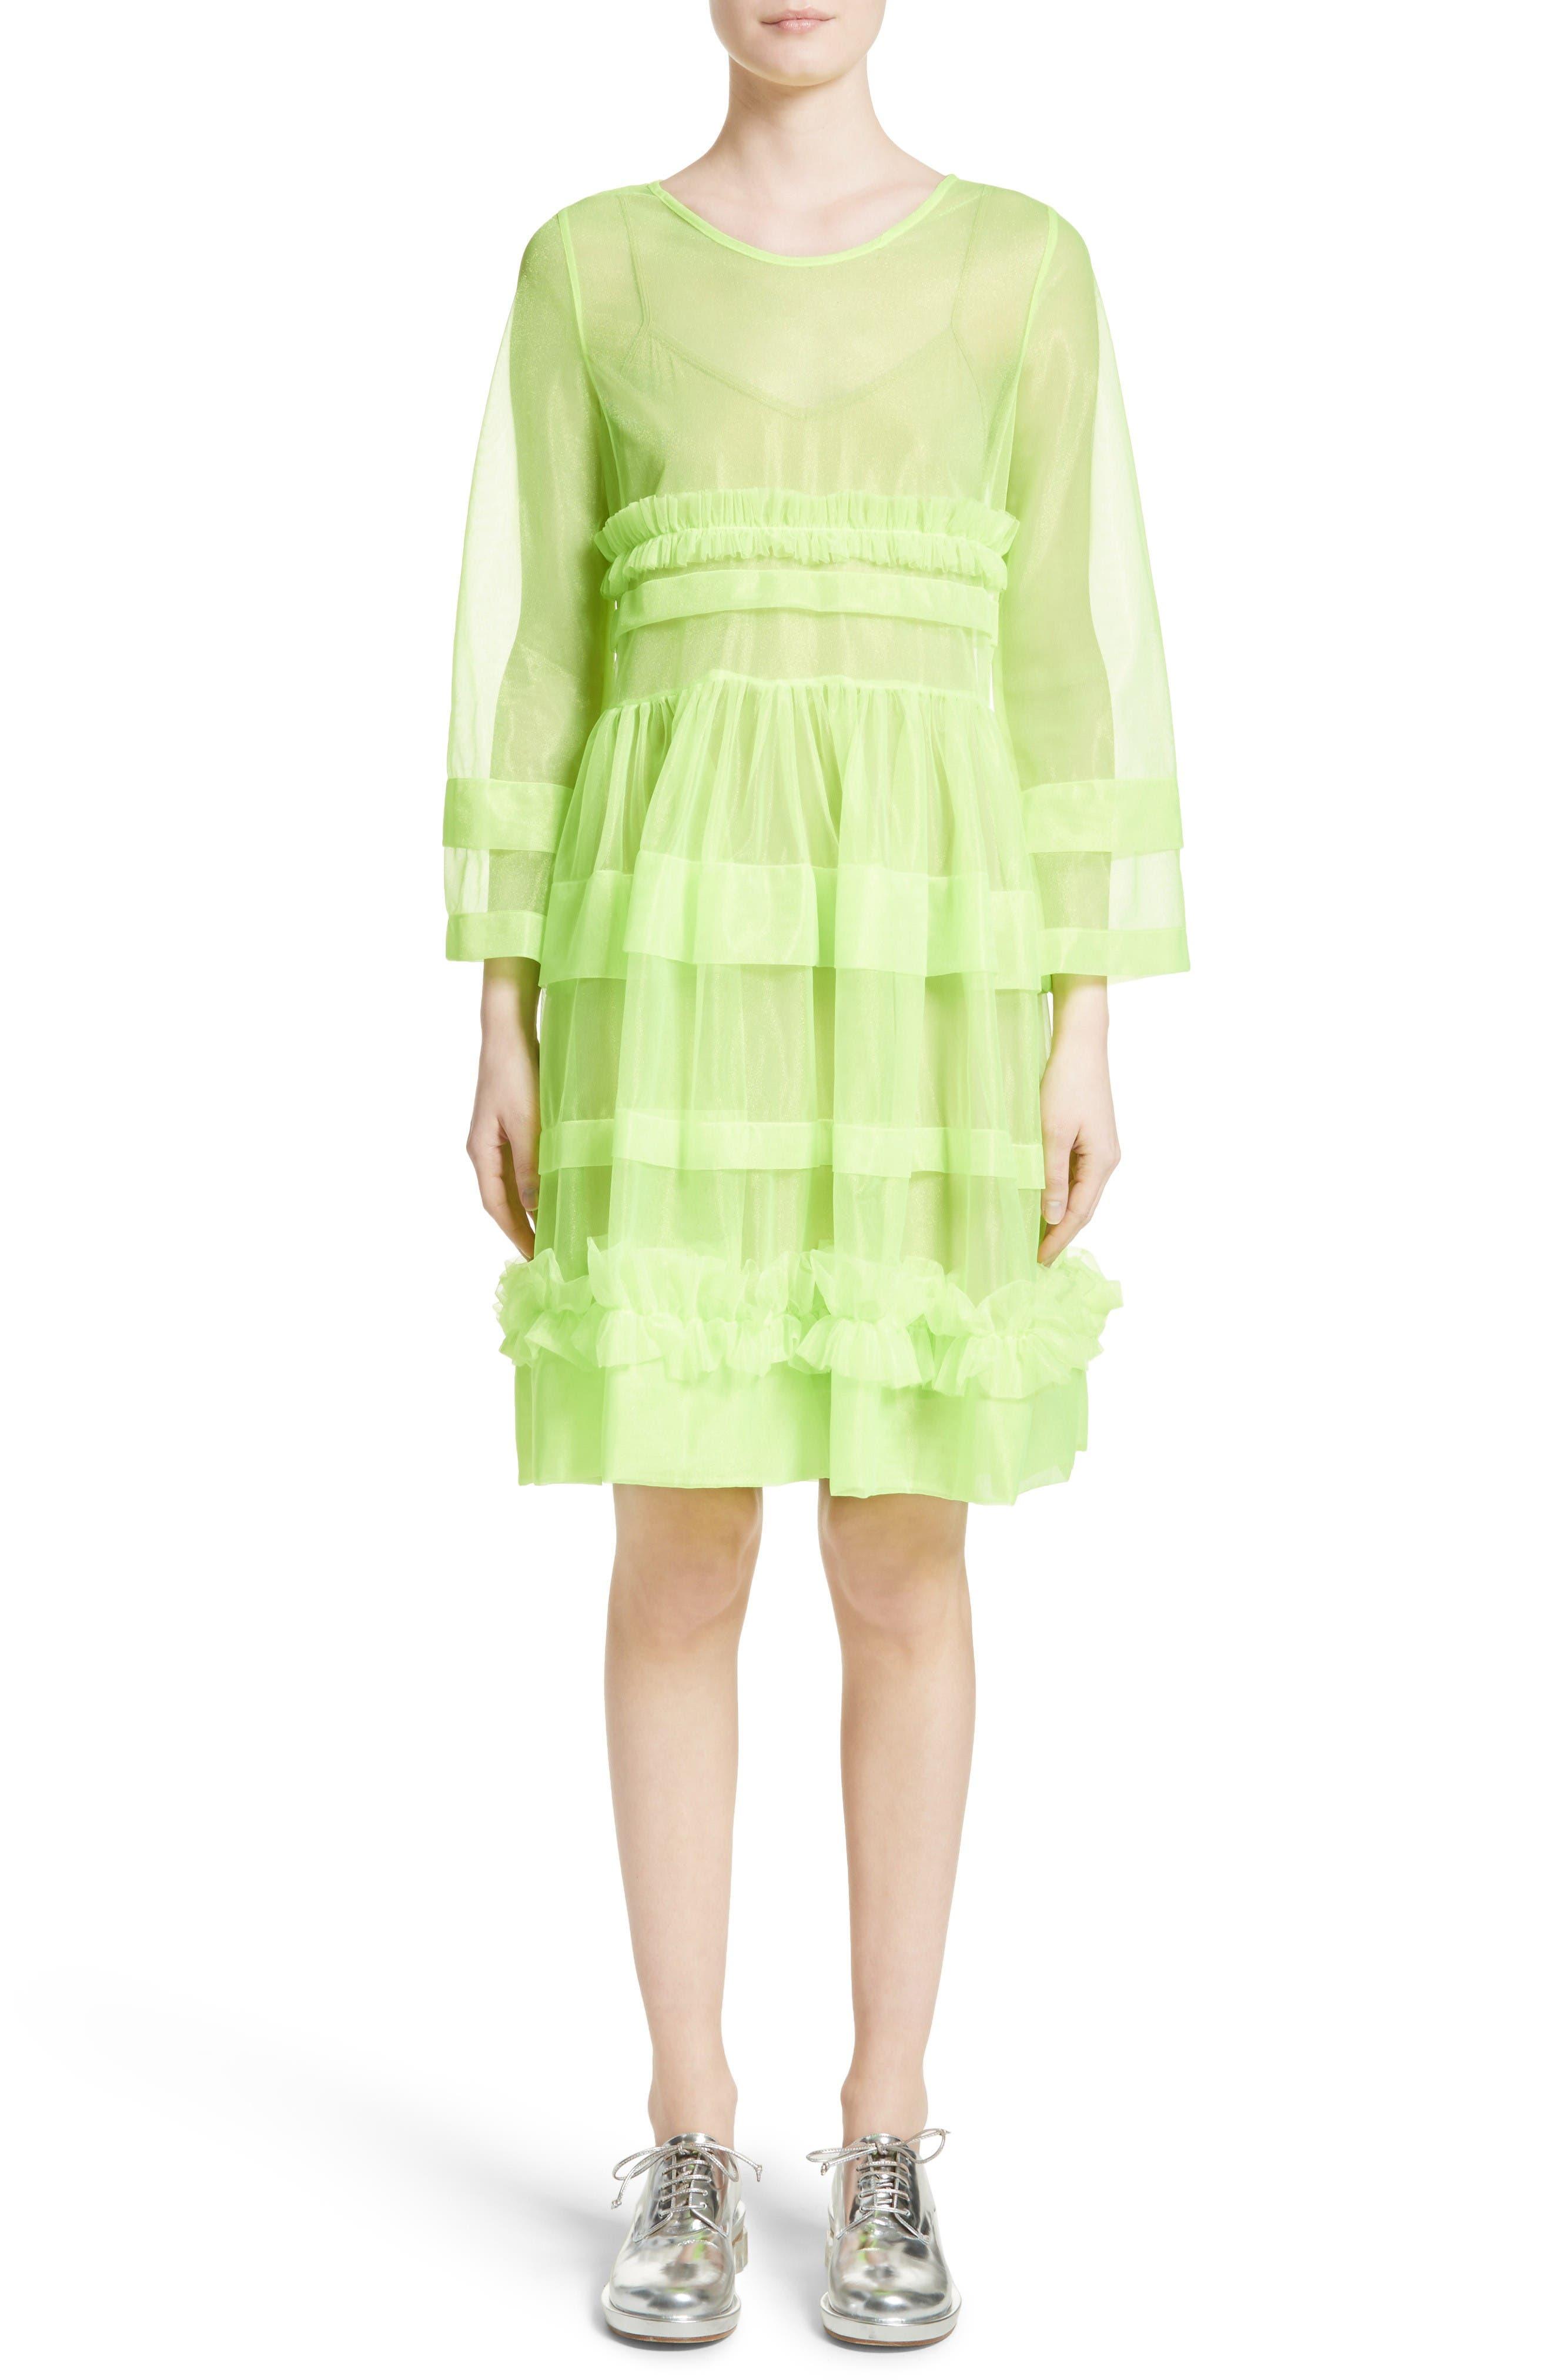 Molly Goddard Patty Dress